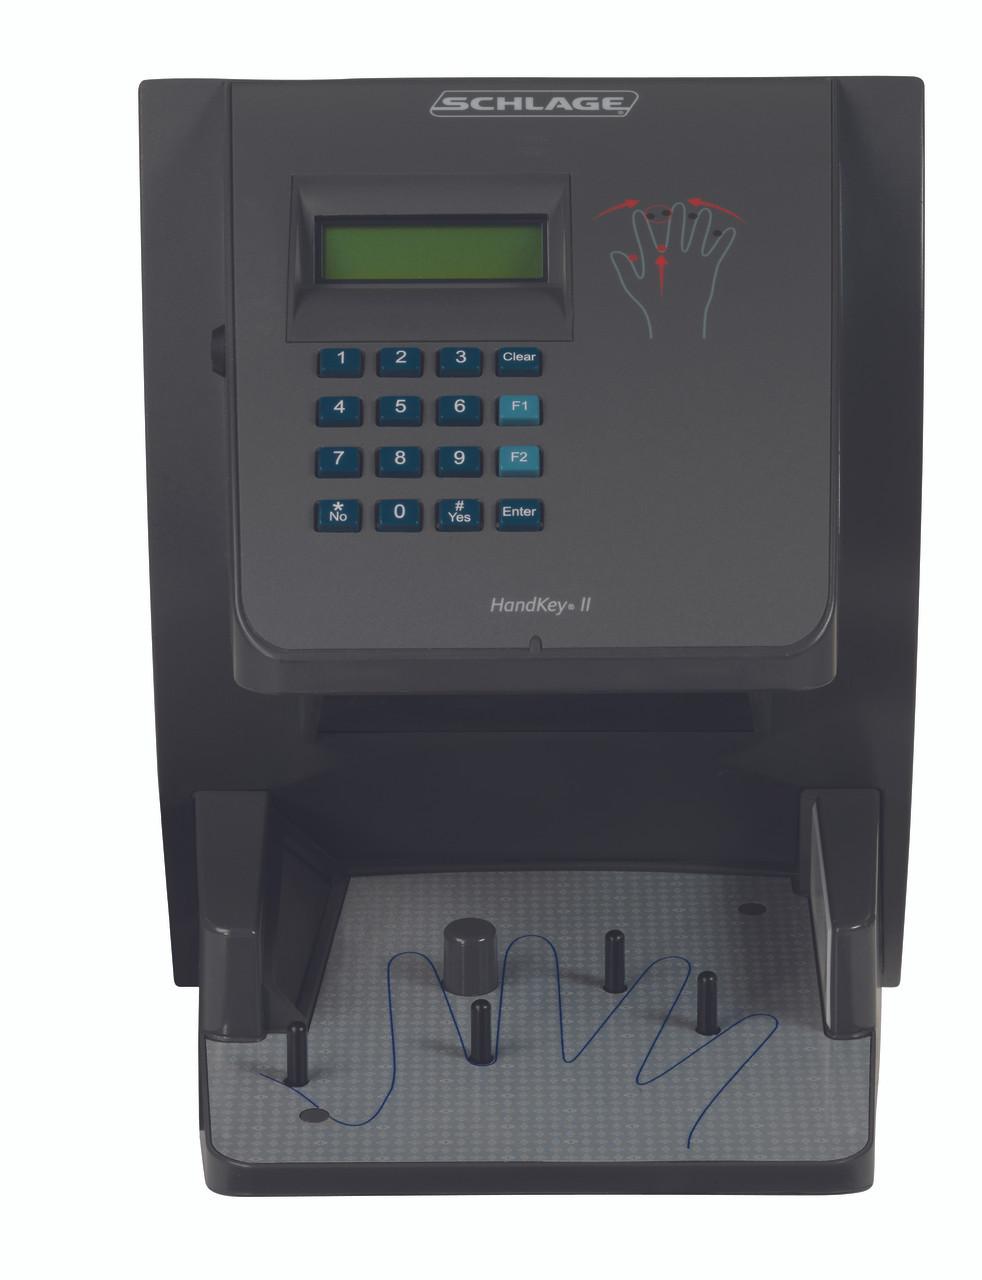 schlage handkey ii biometric handreaders electronic access terminals rh lockandhinge com schlage handkey ii user manual schlage handkey ii manual